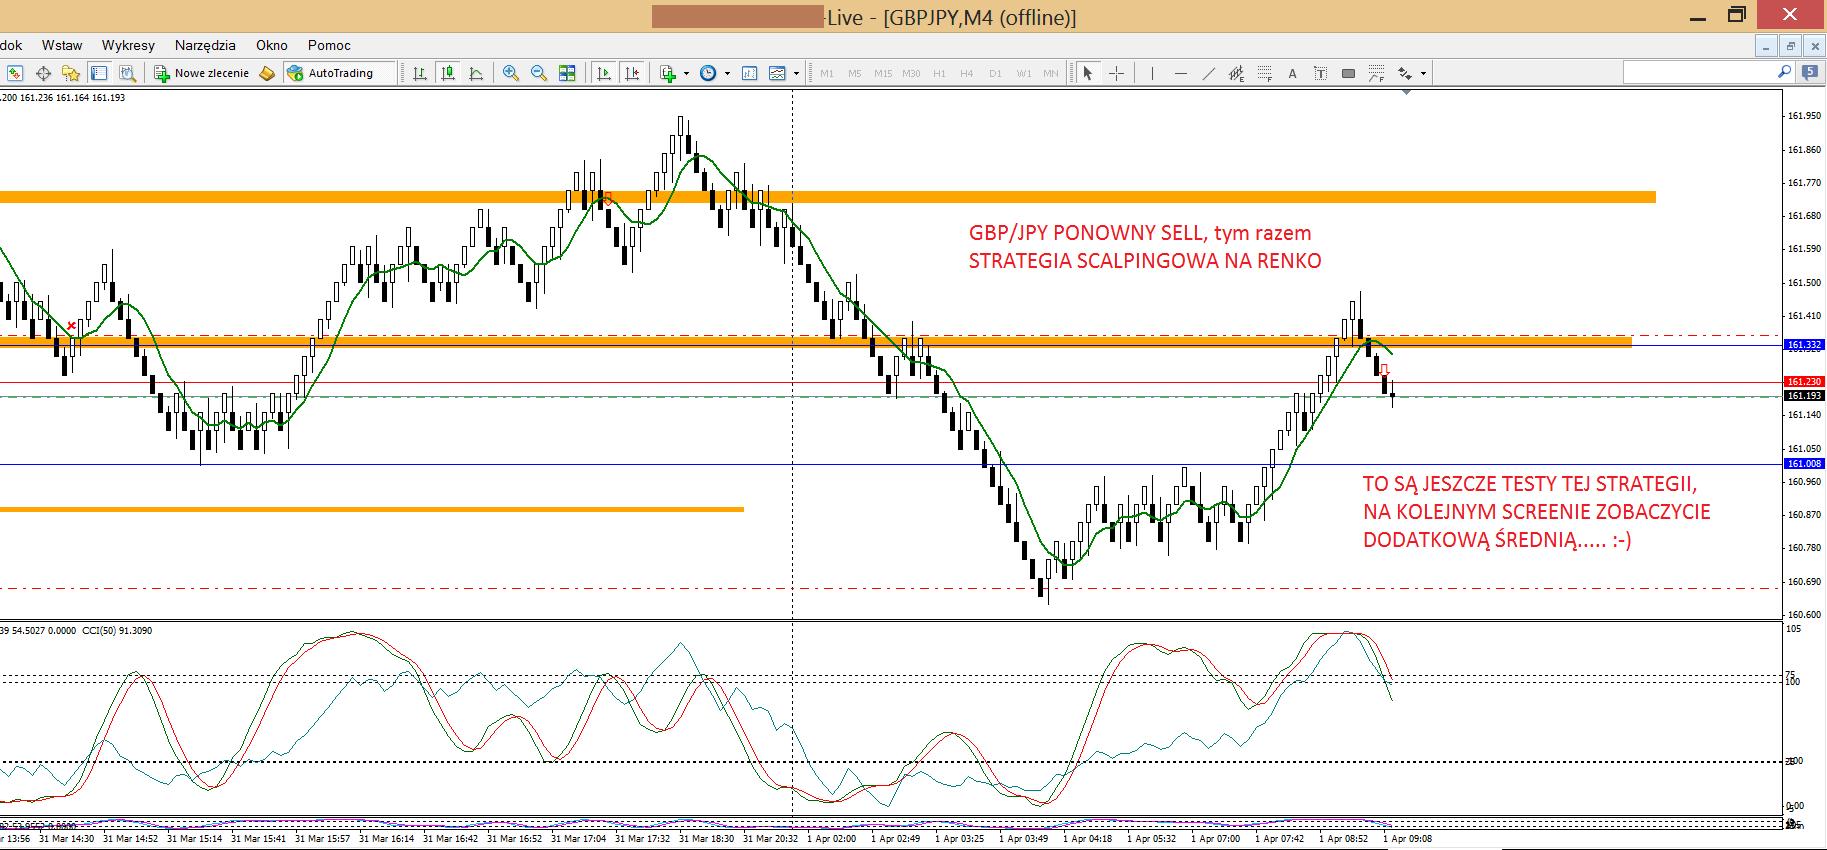 1-forex-scalping-skuteczna strategia na forex-renko-scalping na renko-trading-trader-dax-waluty